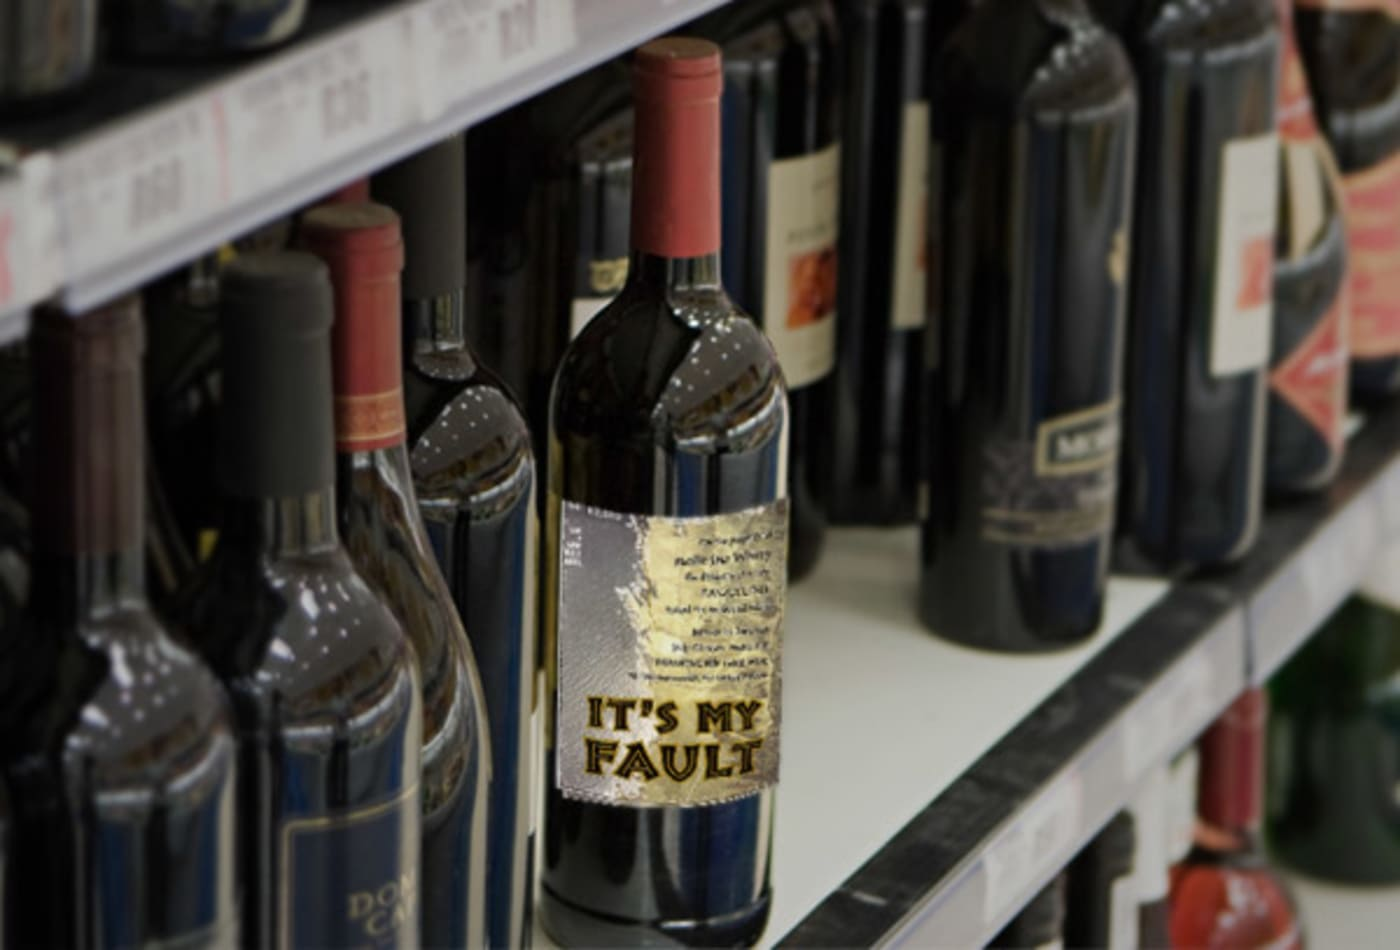 Unique-Wines-its-my-fault.jpg